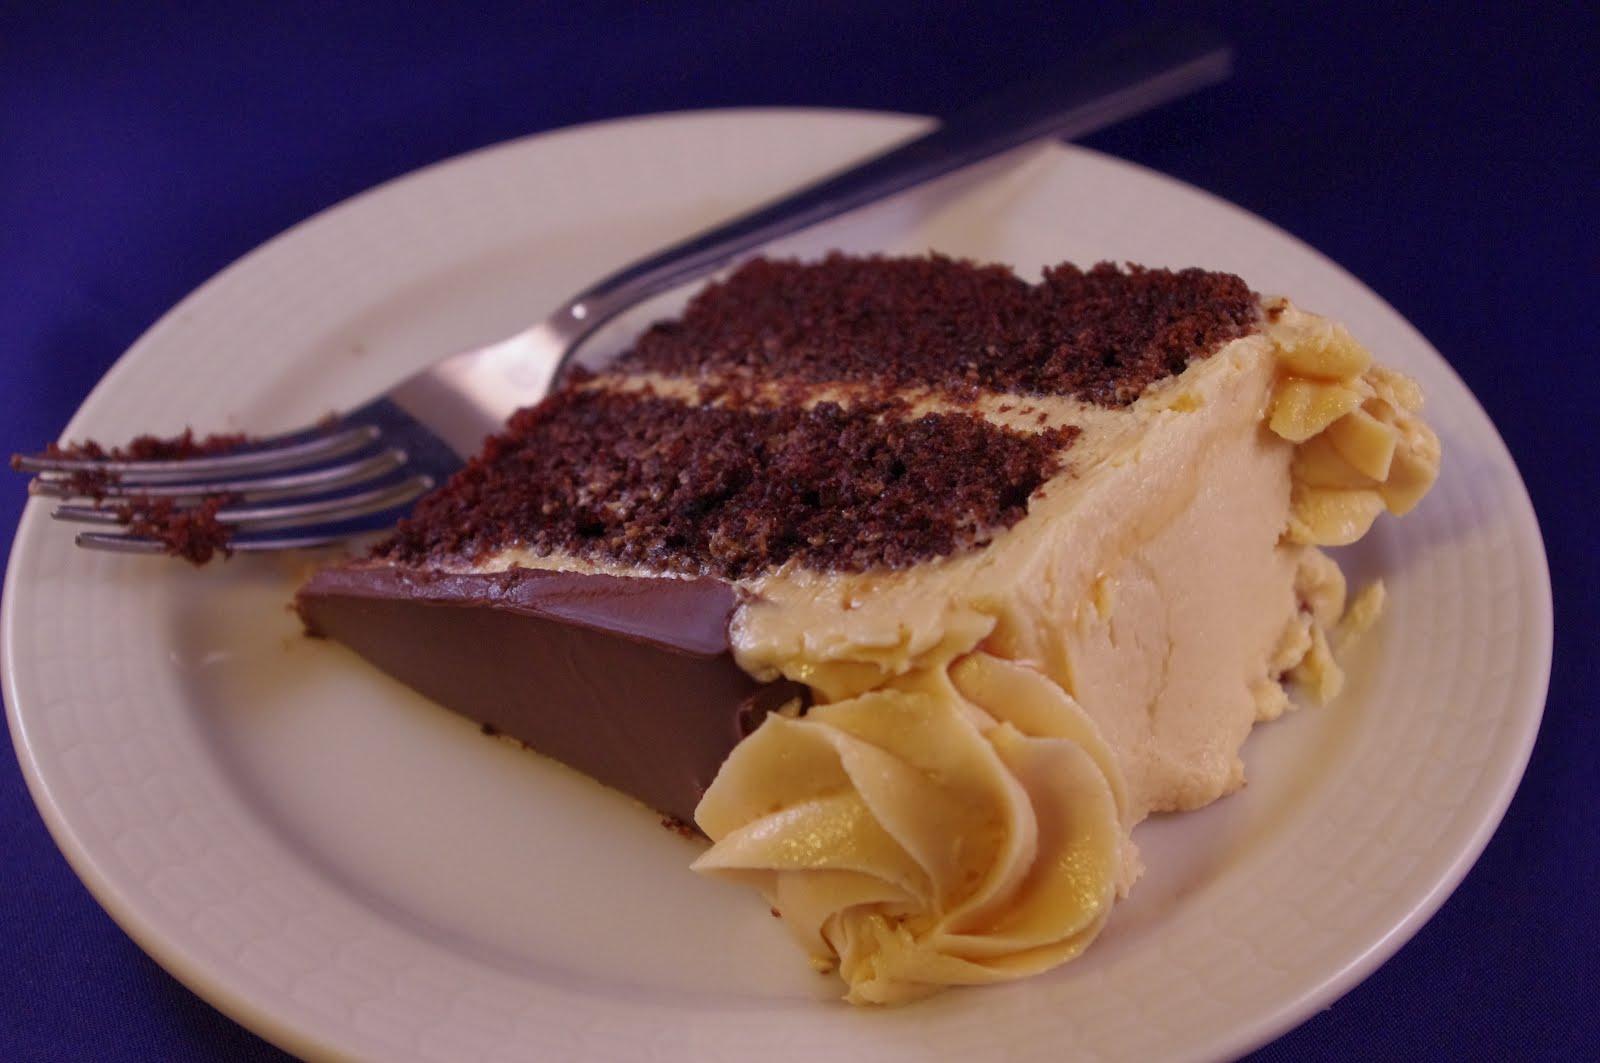 4 Goodness Bake Dark Chocolate Cake With Peanut Butter